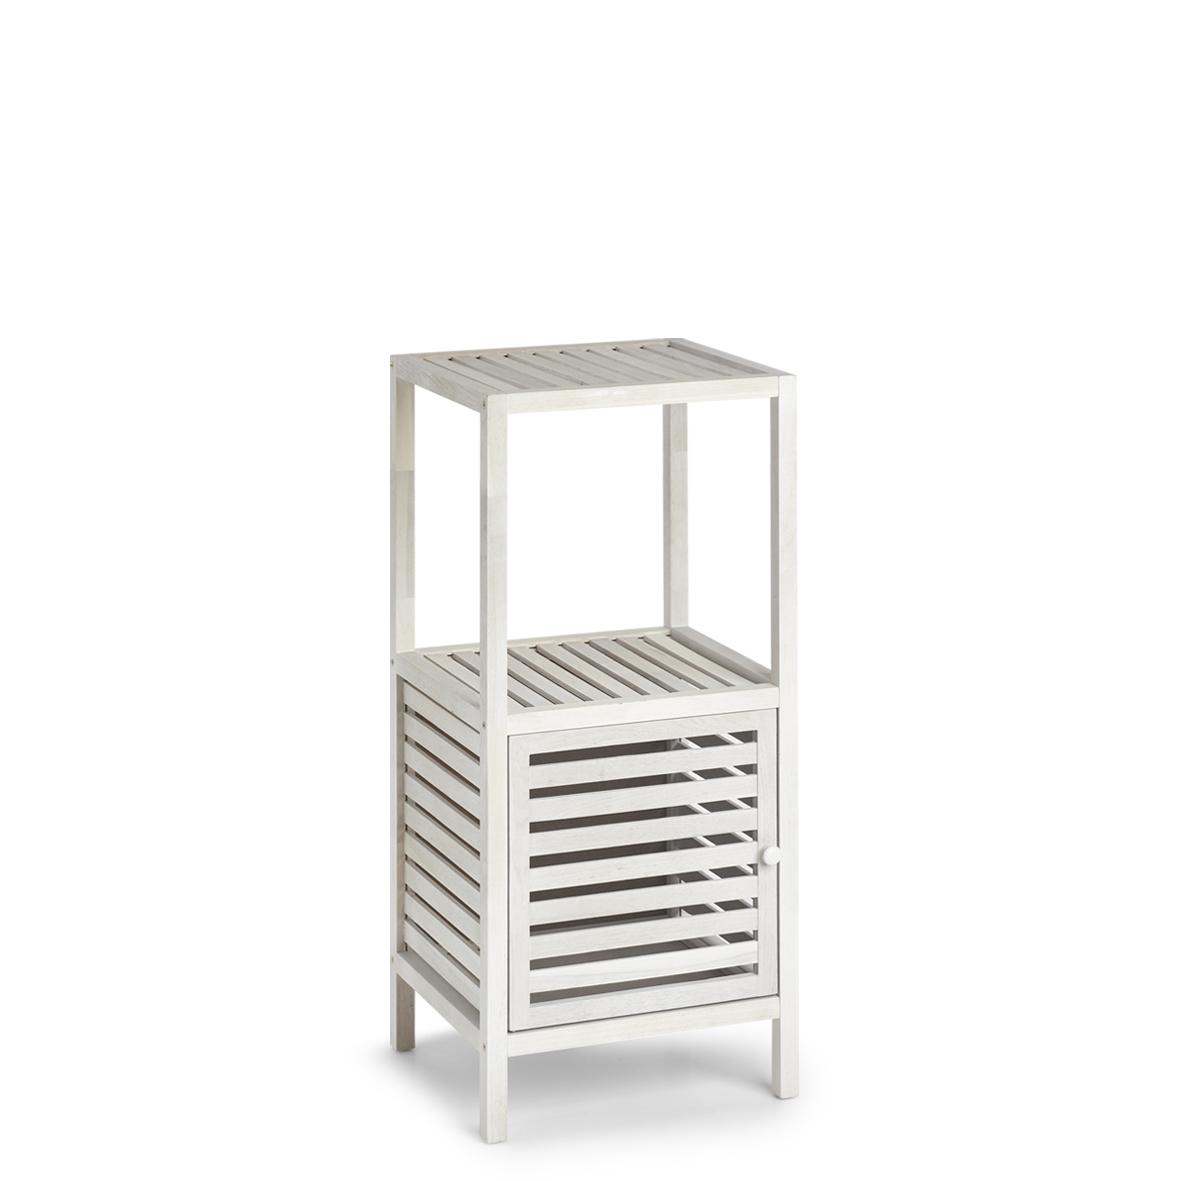 Cabinet din lemn cu 1 usa Wood Alb / Natural, l39,5xA35,5xH86,5 cm